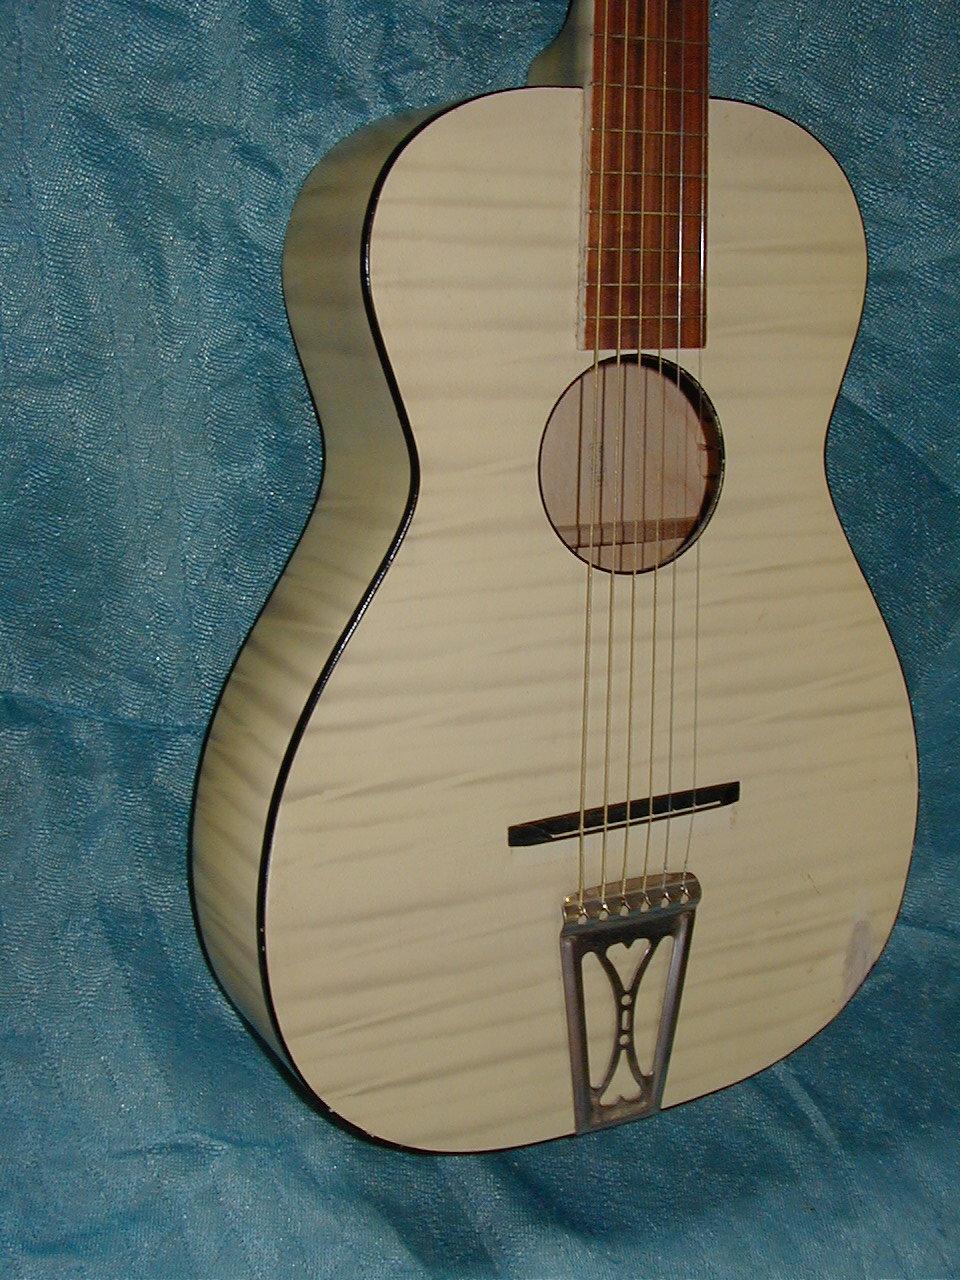 Harmony, the People's Guitar